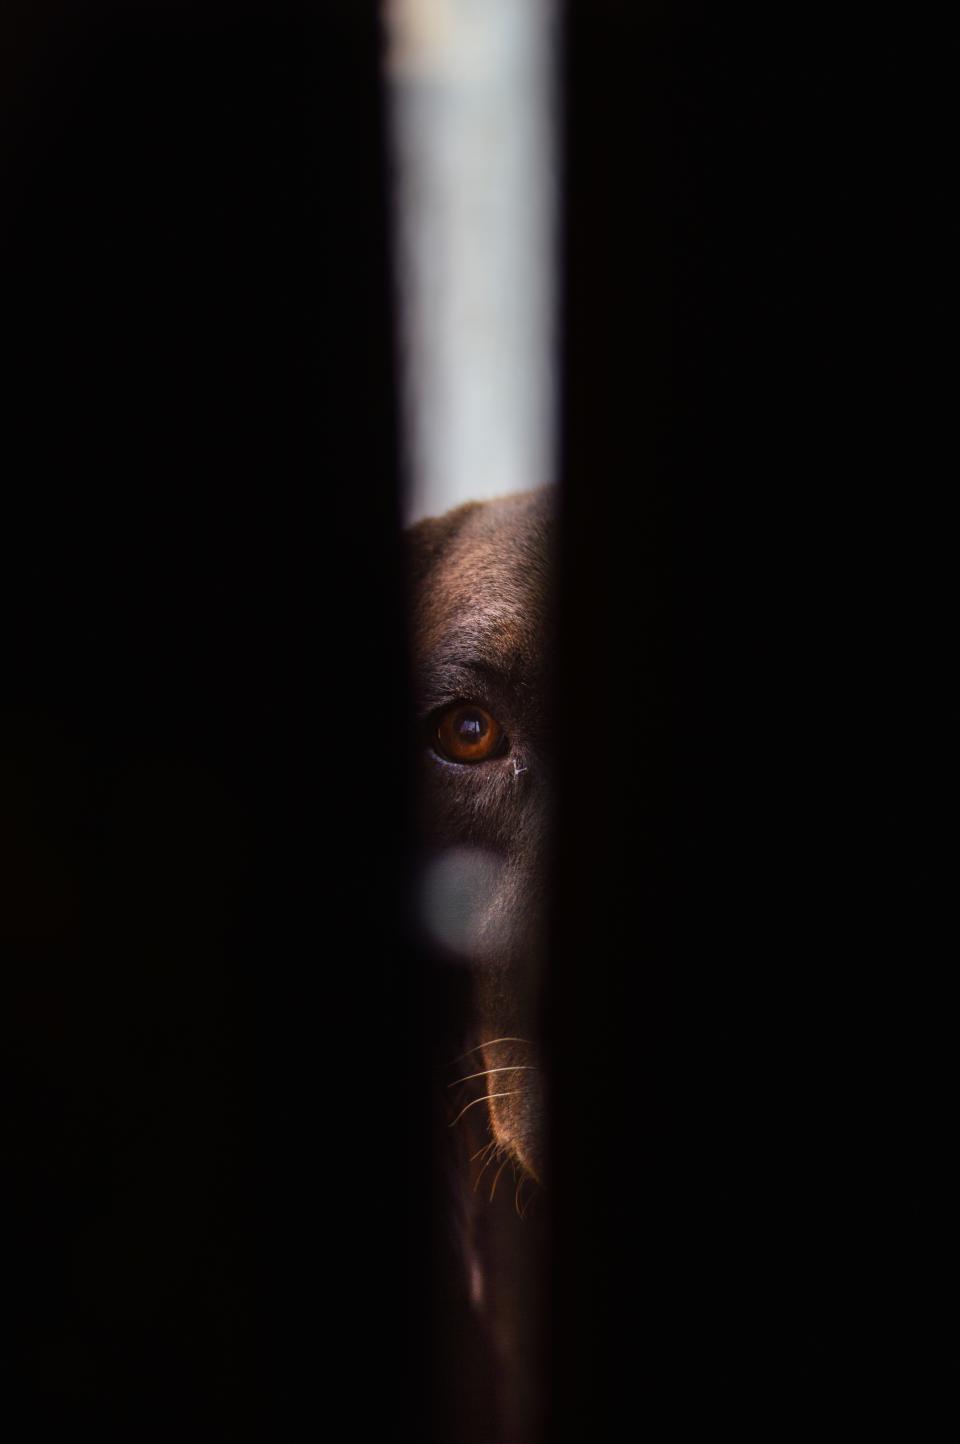 dark, black, dog, animal, pet, eye